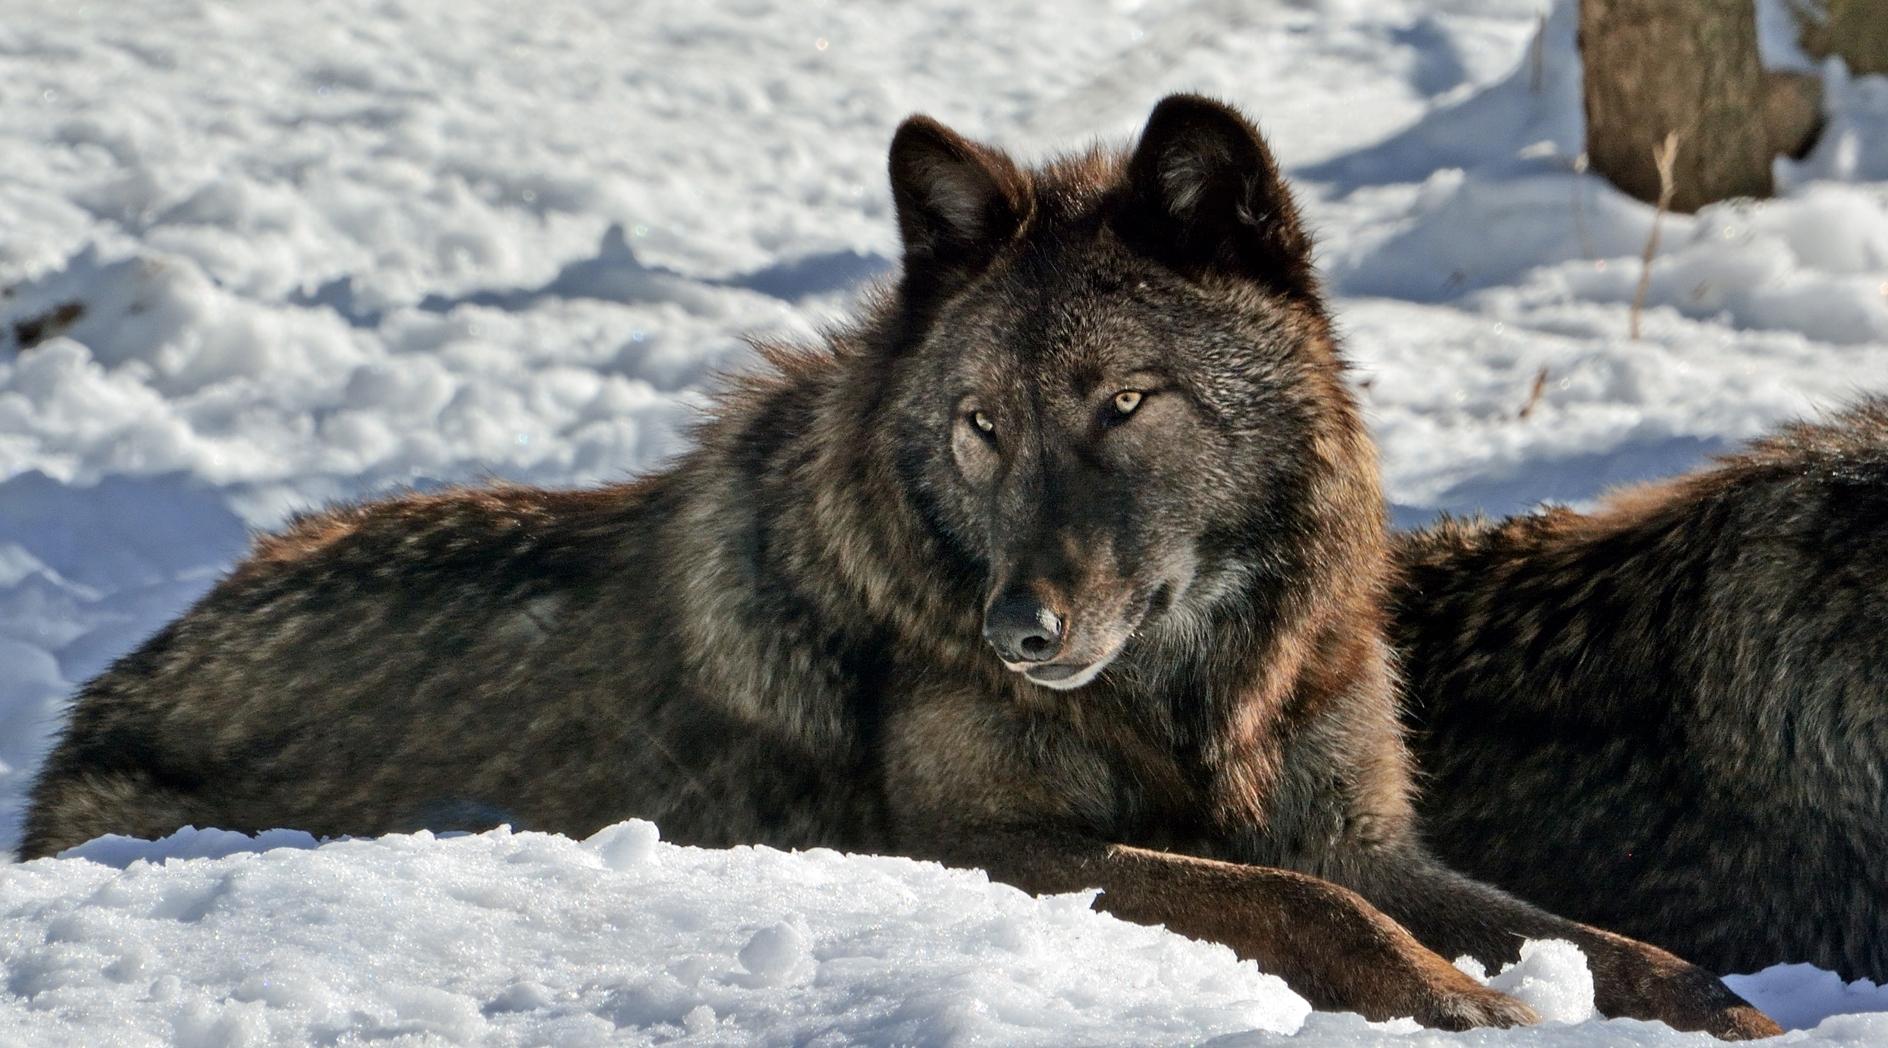 Spinus-gray-wolf-2015-01-n027446-w.jpg